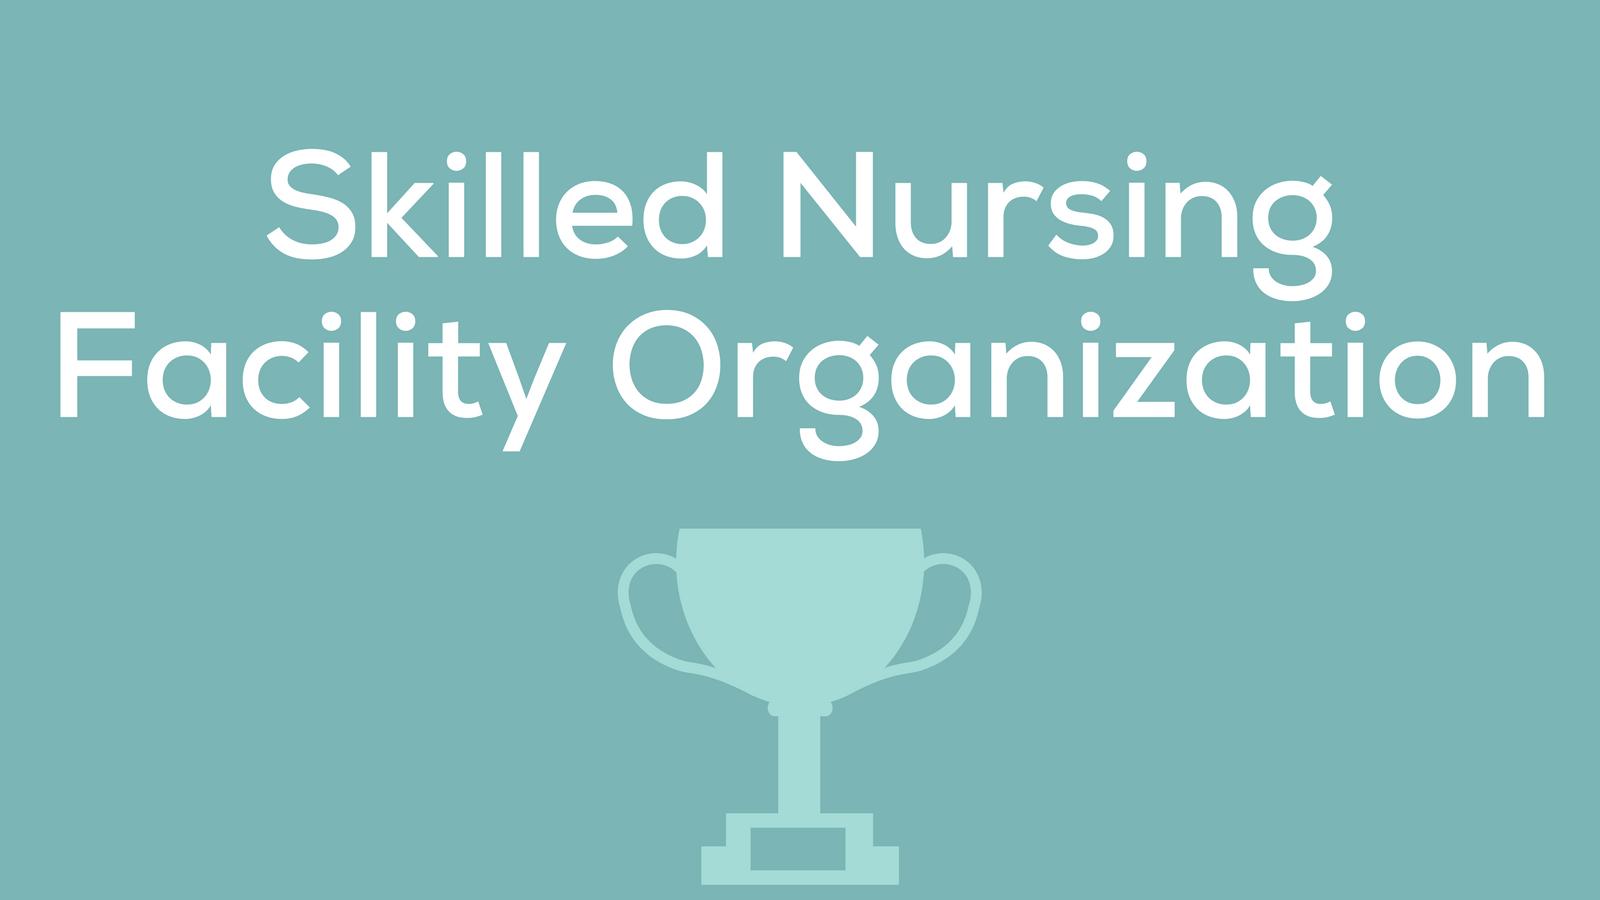 CS - Skilled Nursing Facility Organization.png